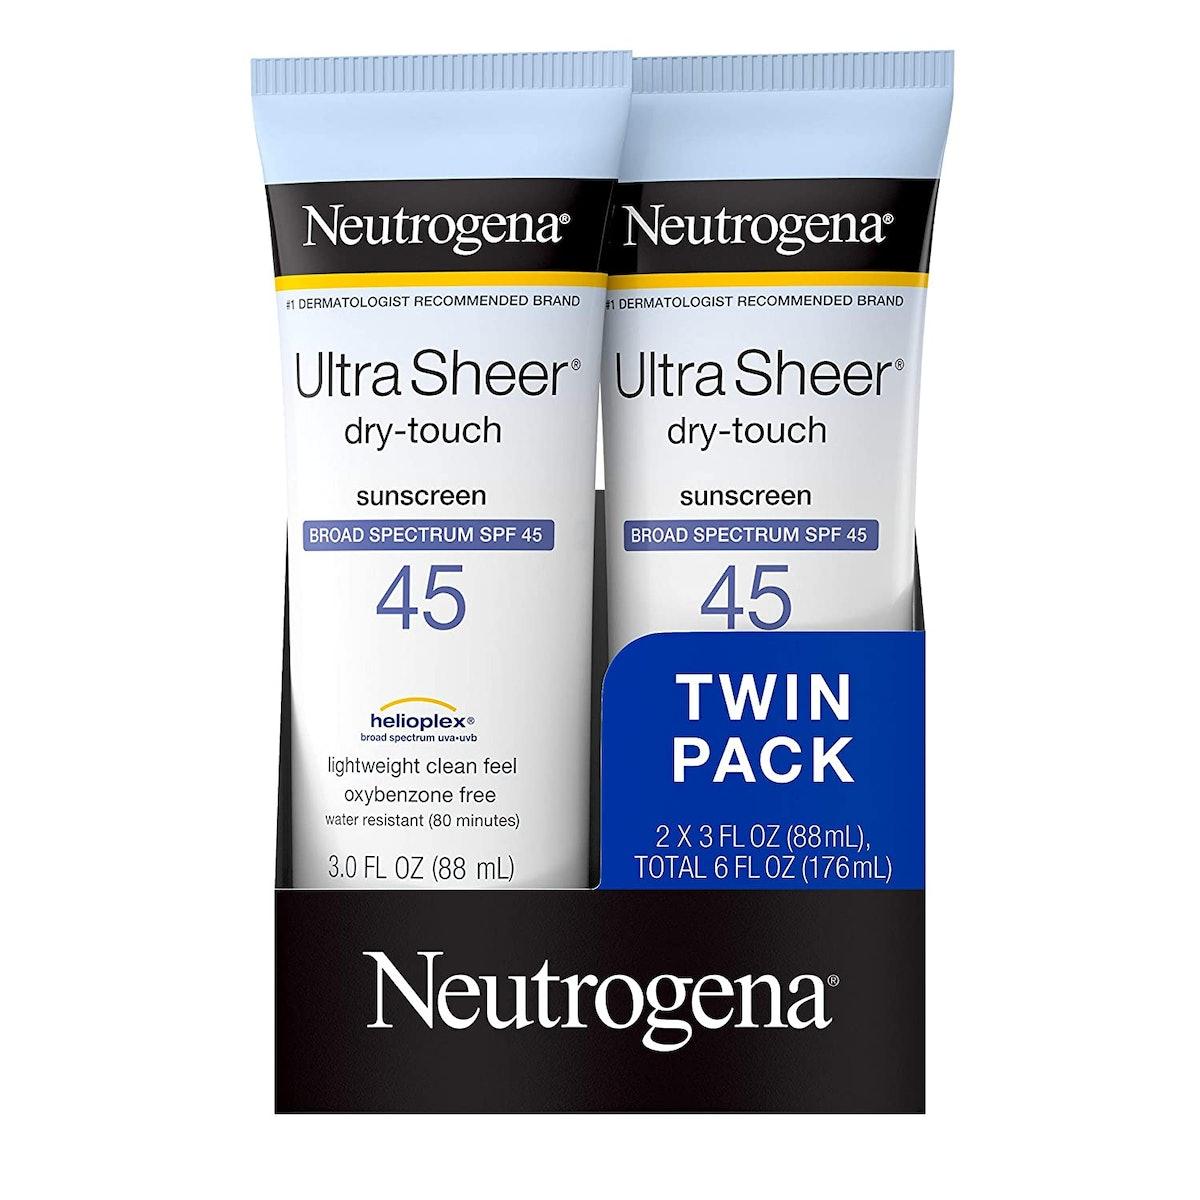 Neutrogena Ultra Sheer Dry-Touch